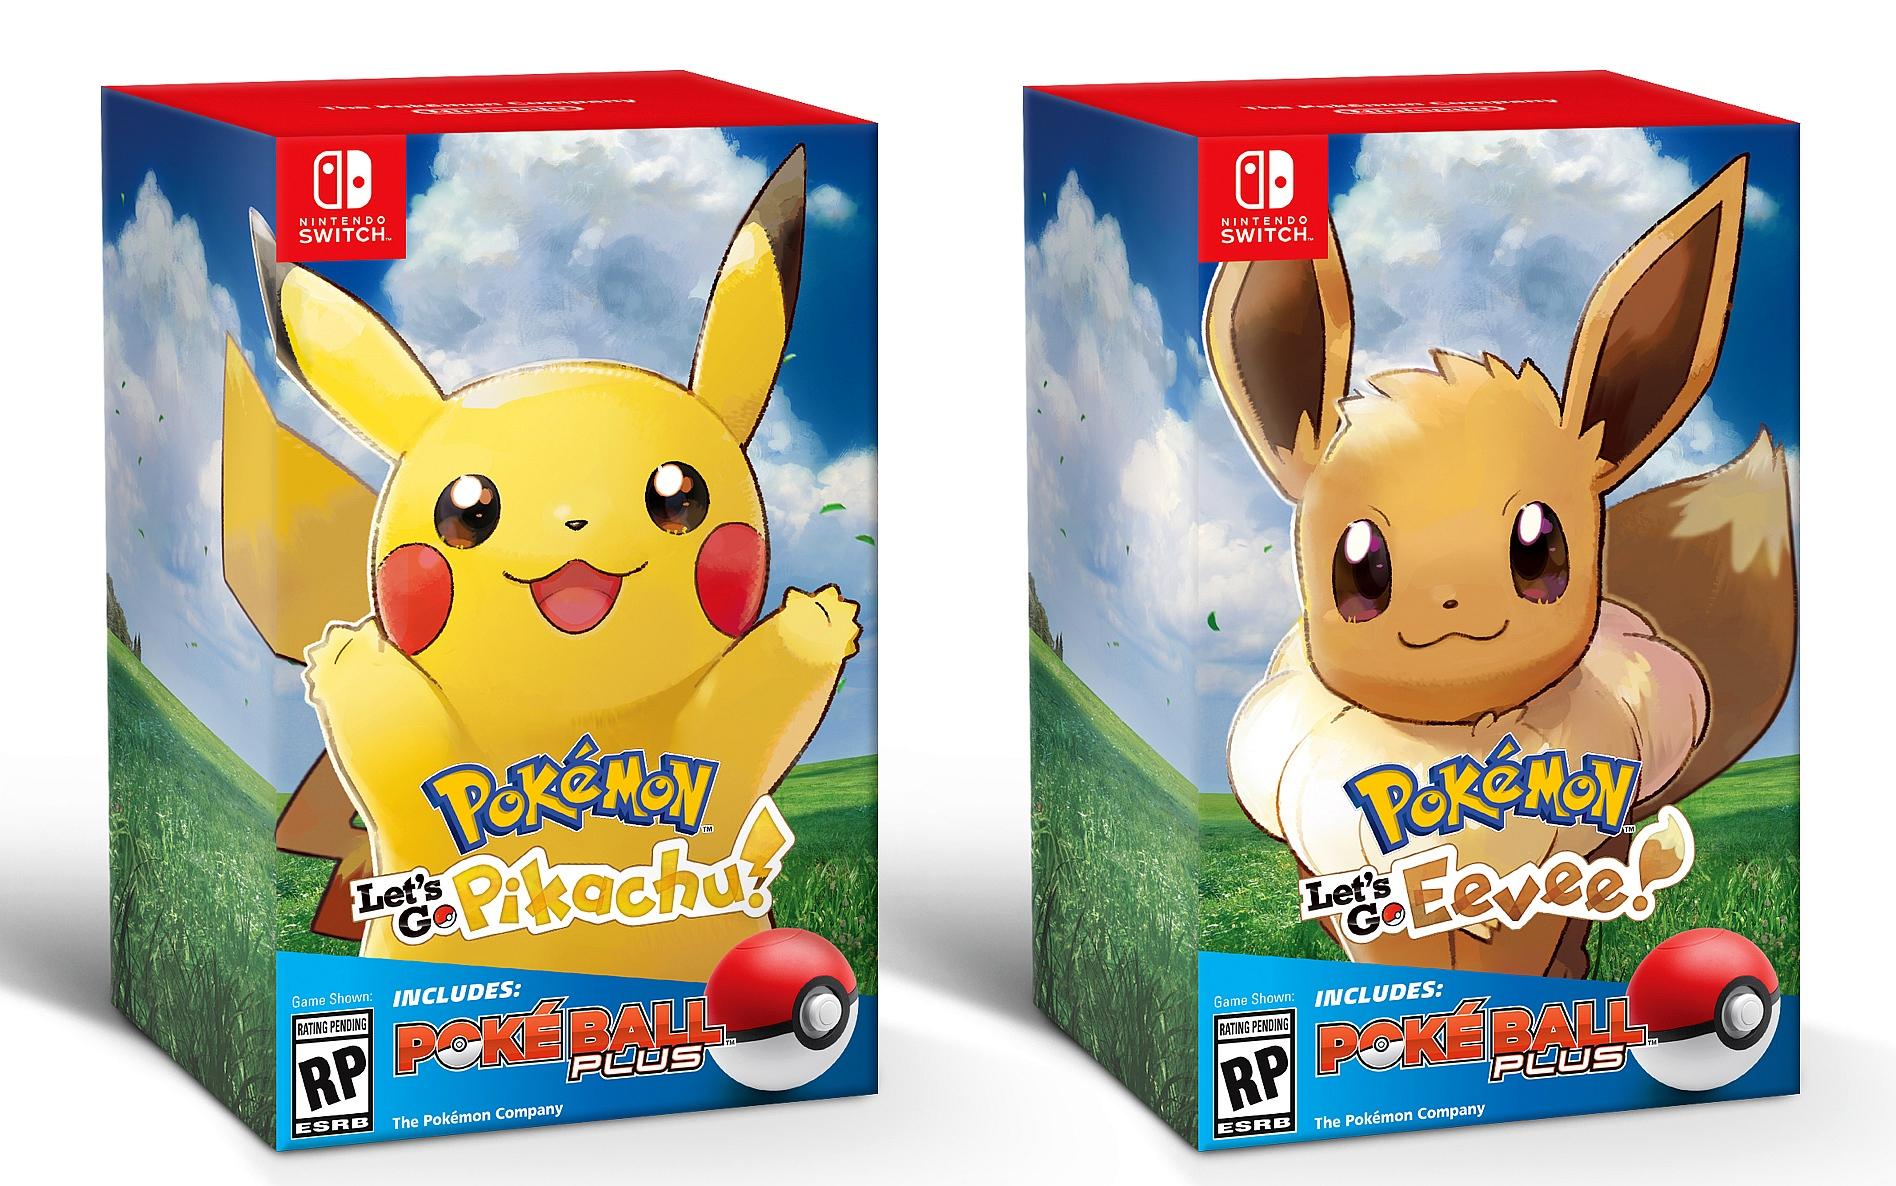 Nintendo_PokemonLetsGoPikachuPokeBallPlusPack 1